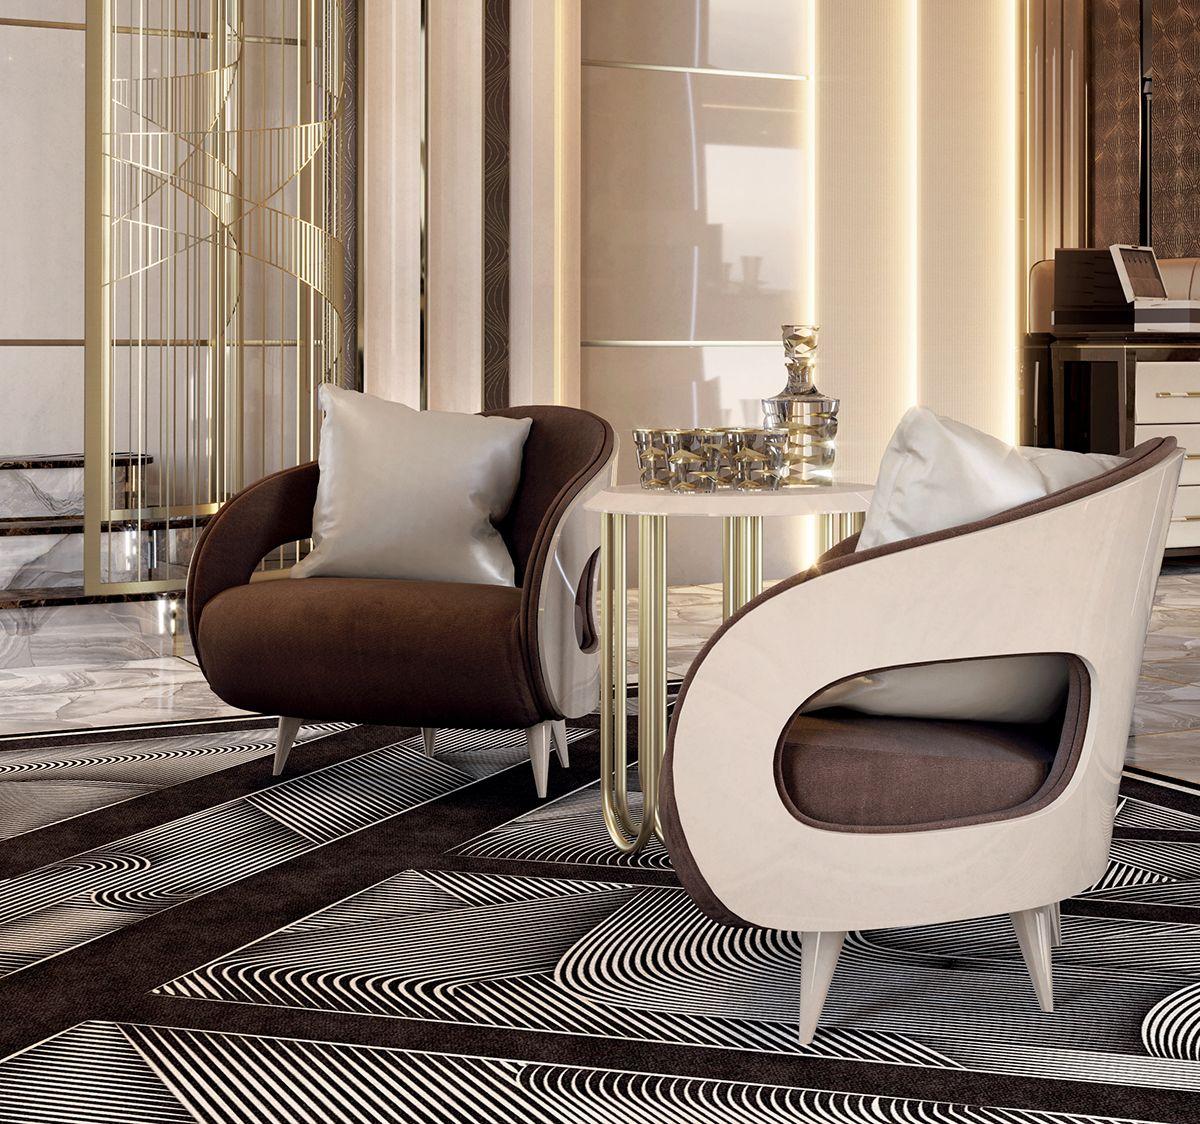 Italian Sofa Jakarta: Italian Furniture For Exclusive And Modern Design